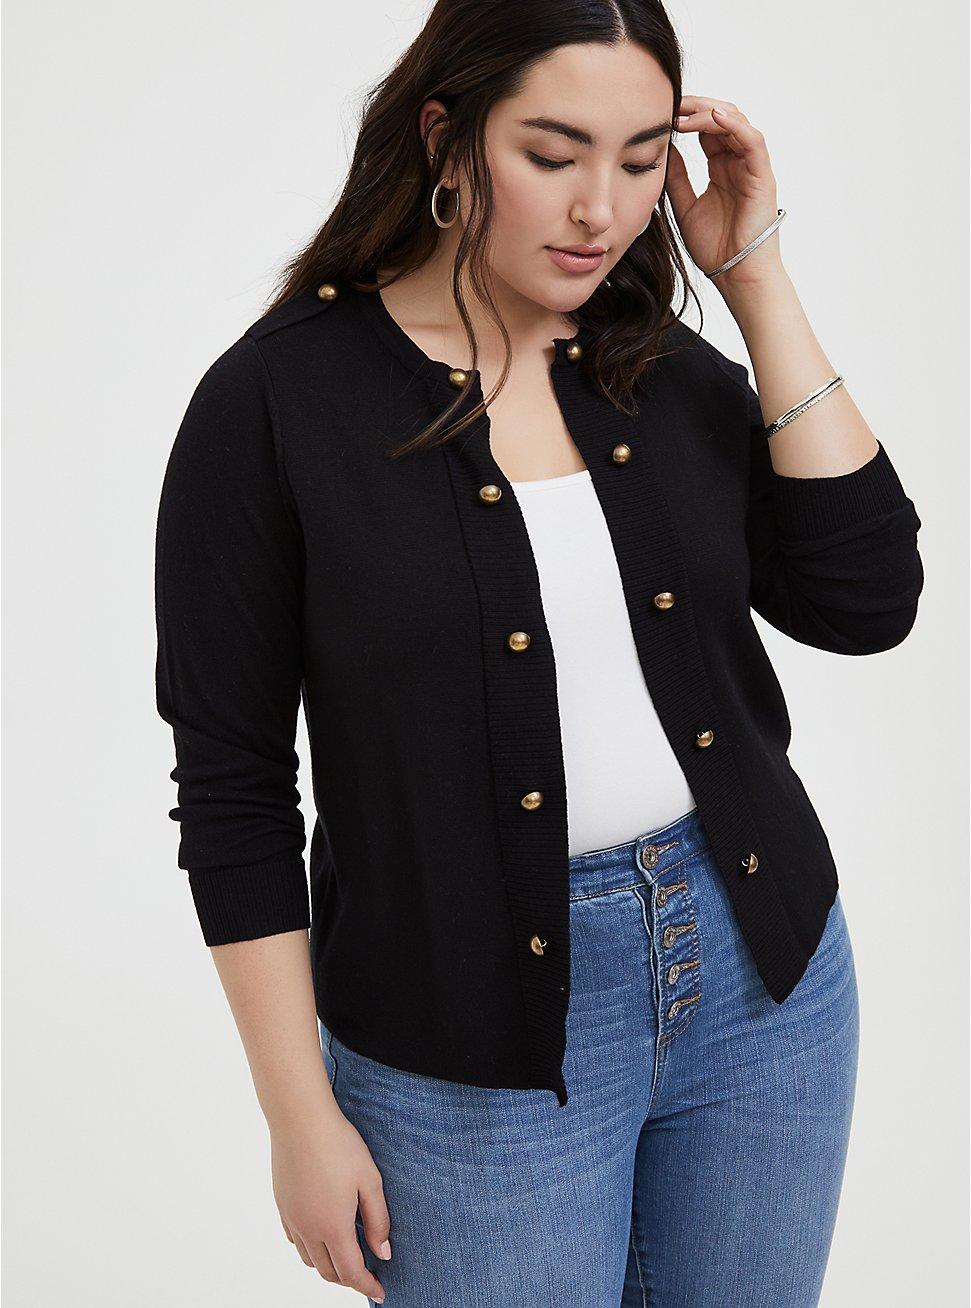 Black Sweater-Knit Military Jacket, DEEP BLACK, hi-res